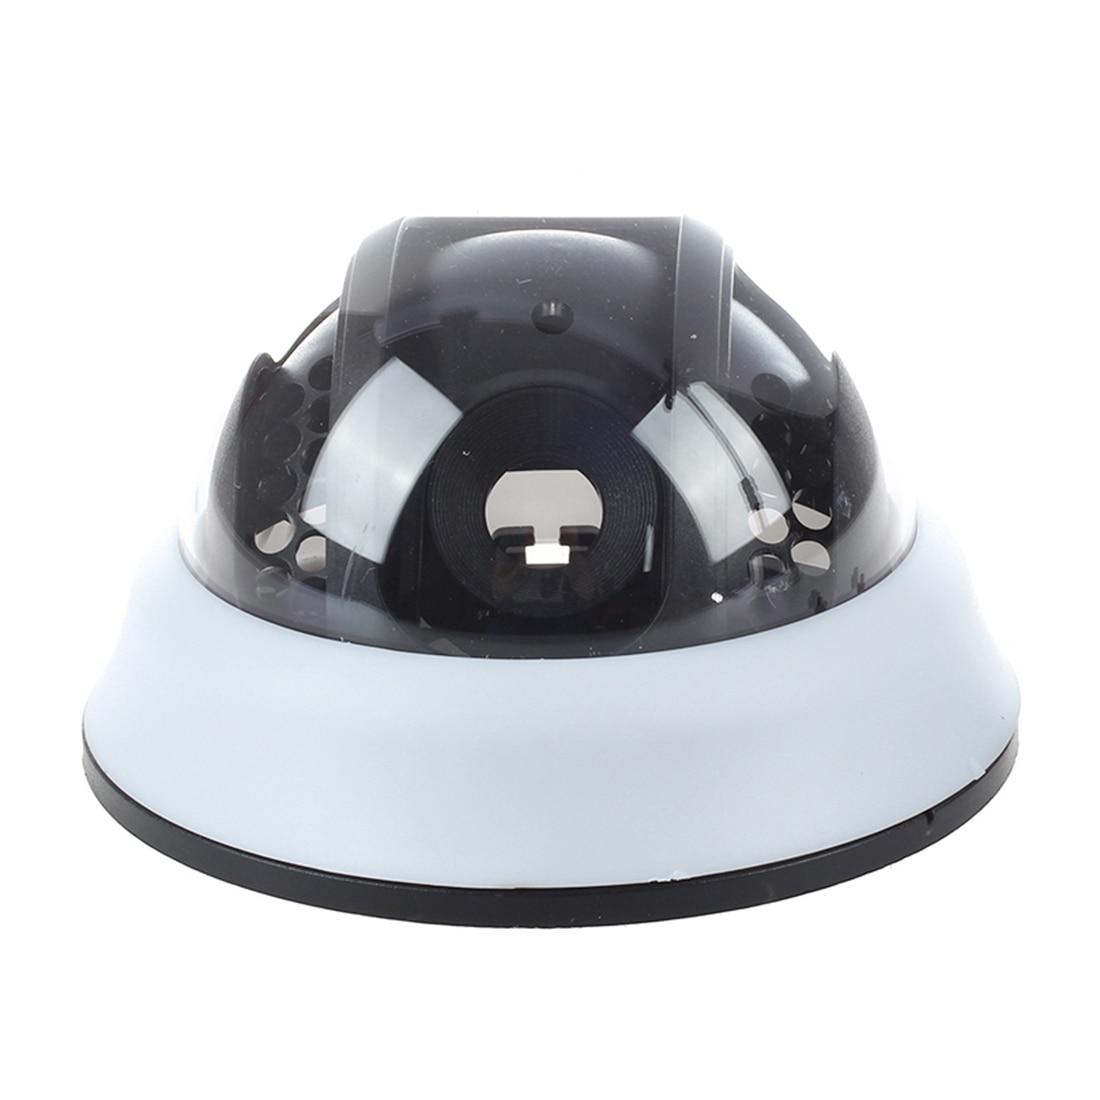 Outdoor CCTV Camera Black White Plastic Shell Round Dome HousingOutdoor CCTV Camera Black White Plastic Shell Round Dome Housing